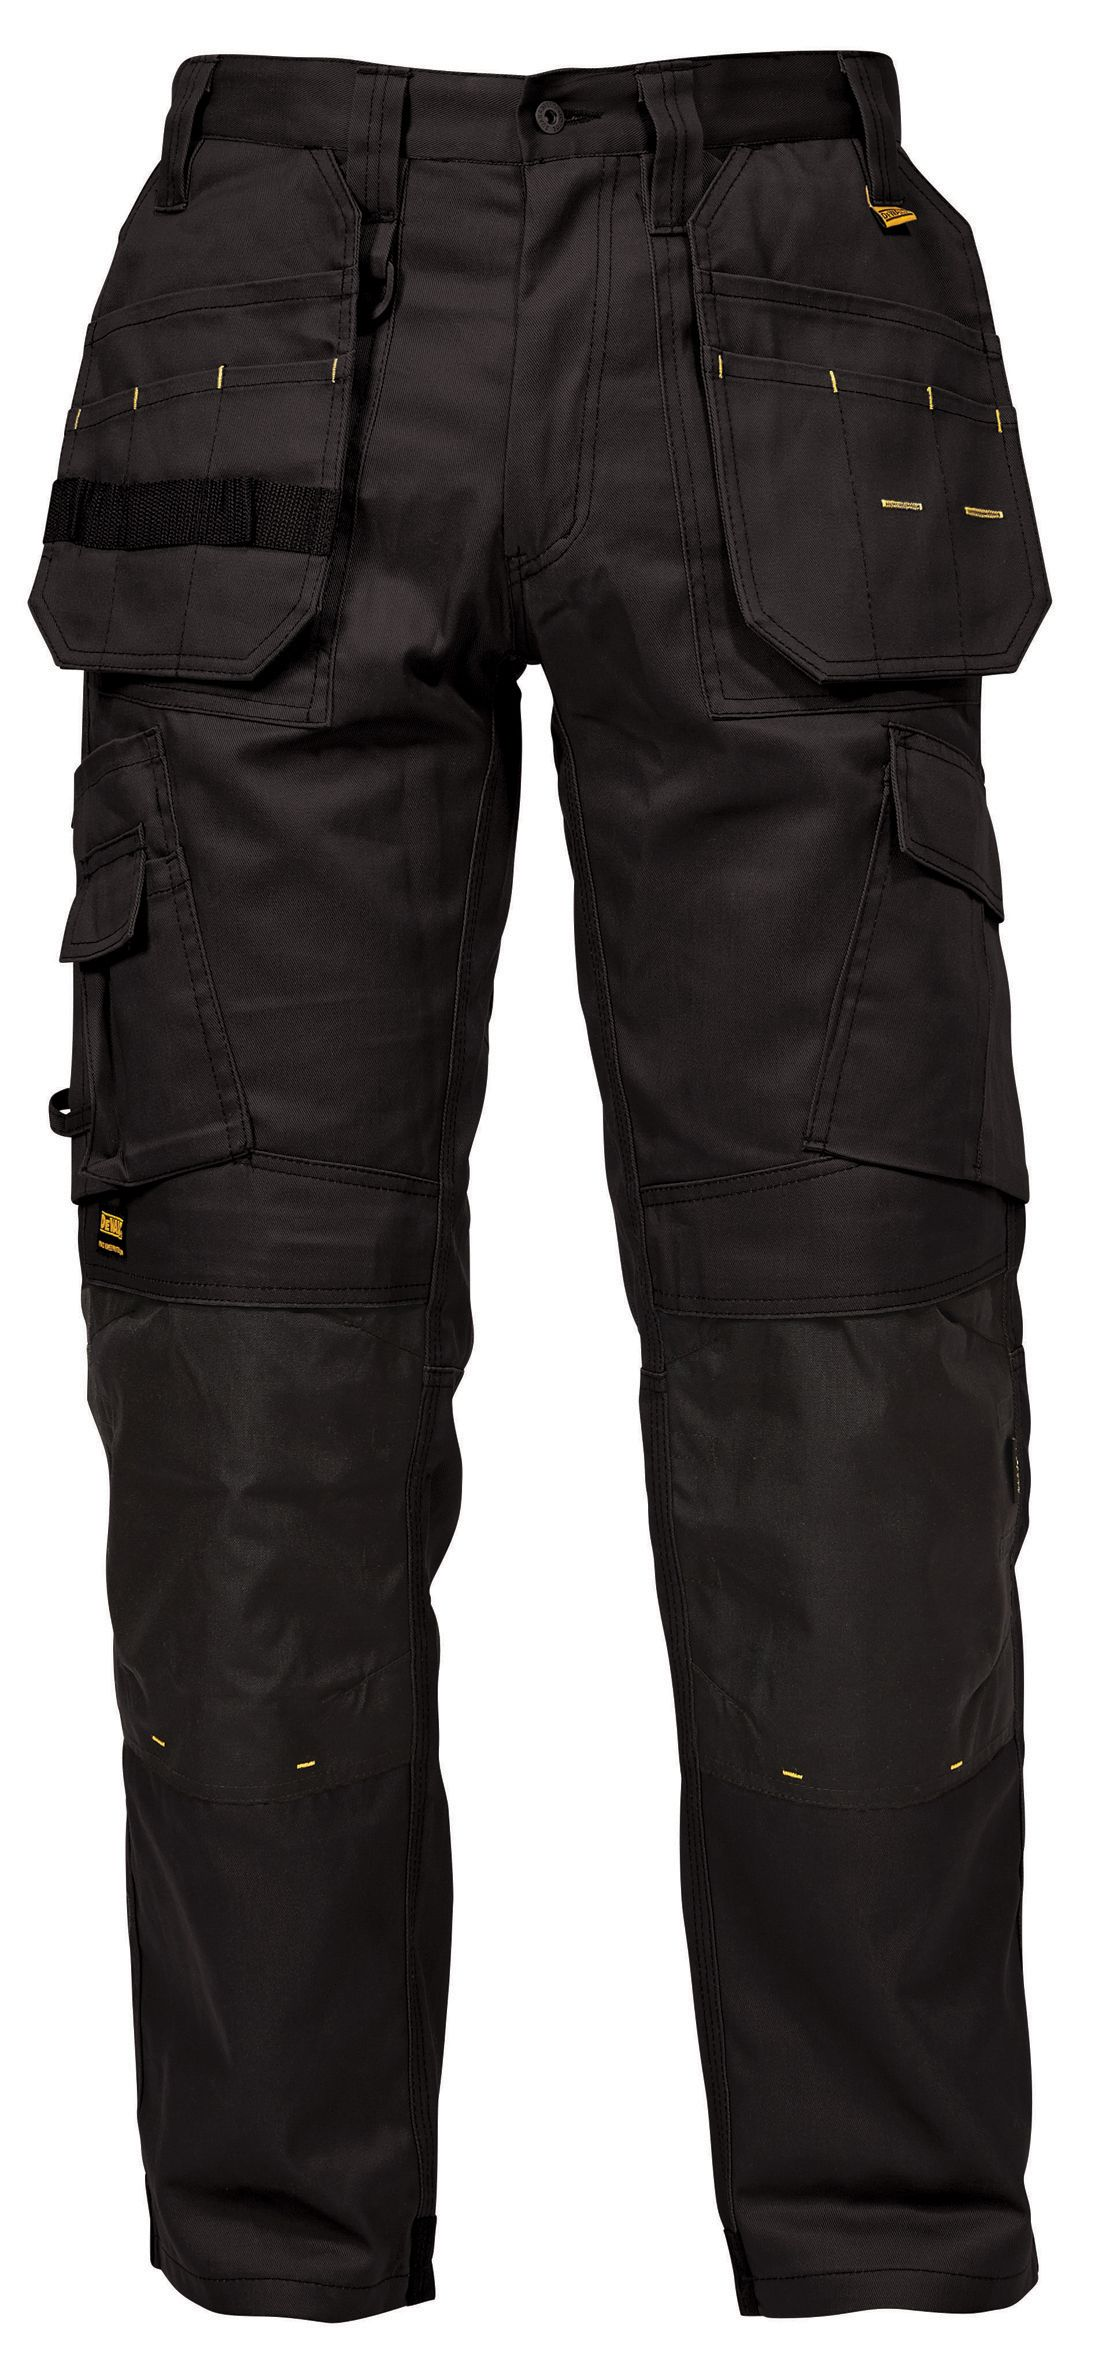 "DeWalt Pro Expert Work Trousers Charcoal Grey / Black 32"" W 31"" L ..."